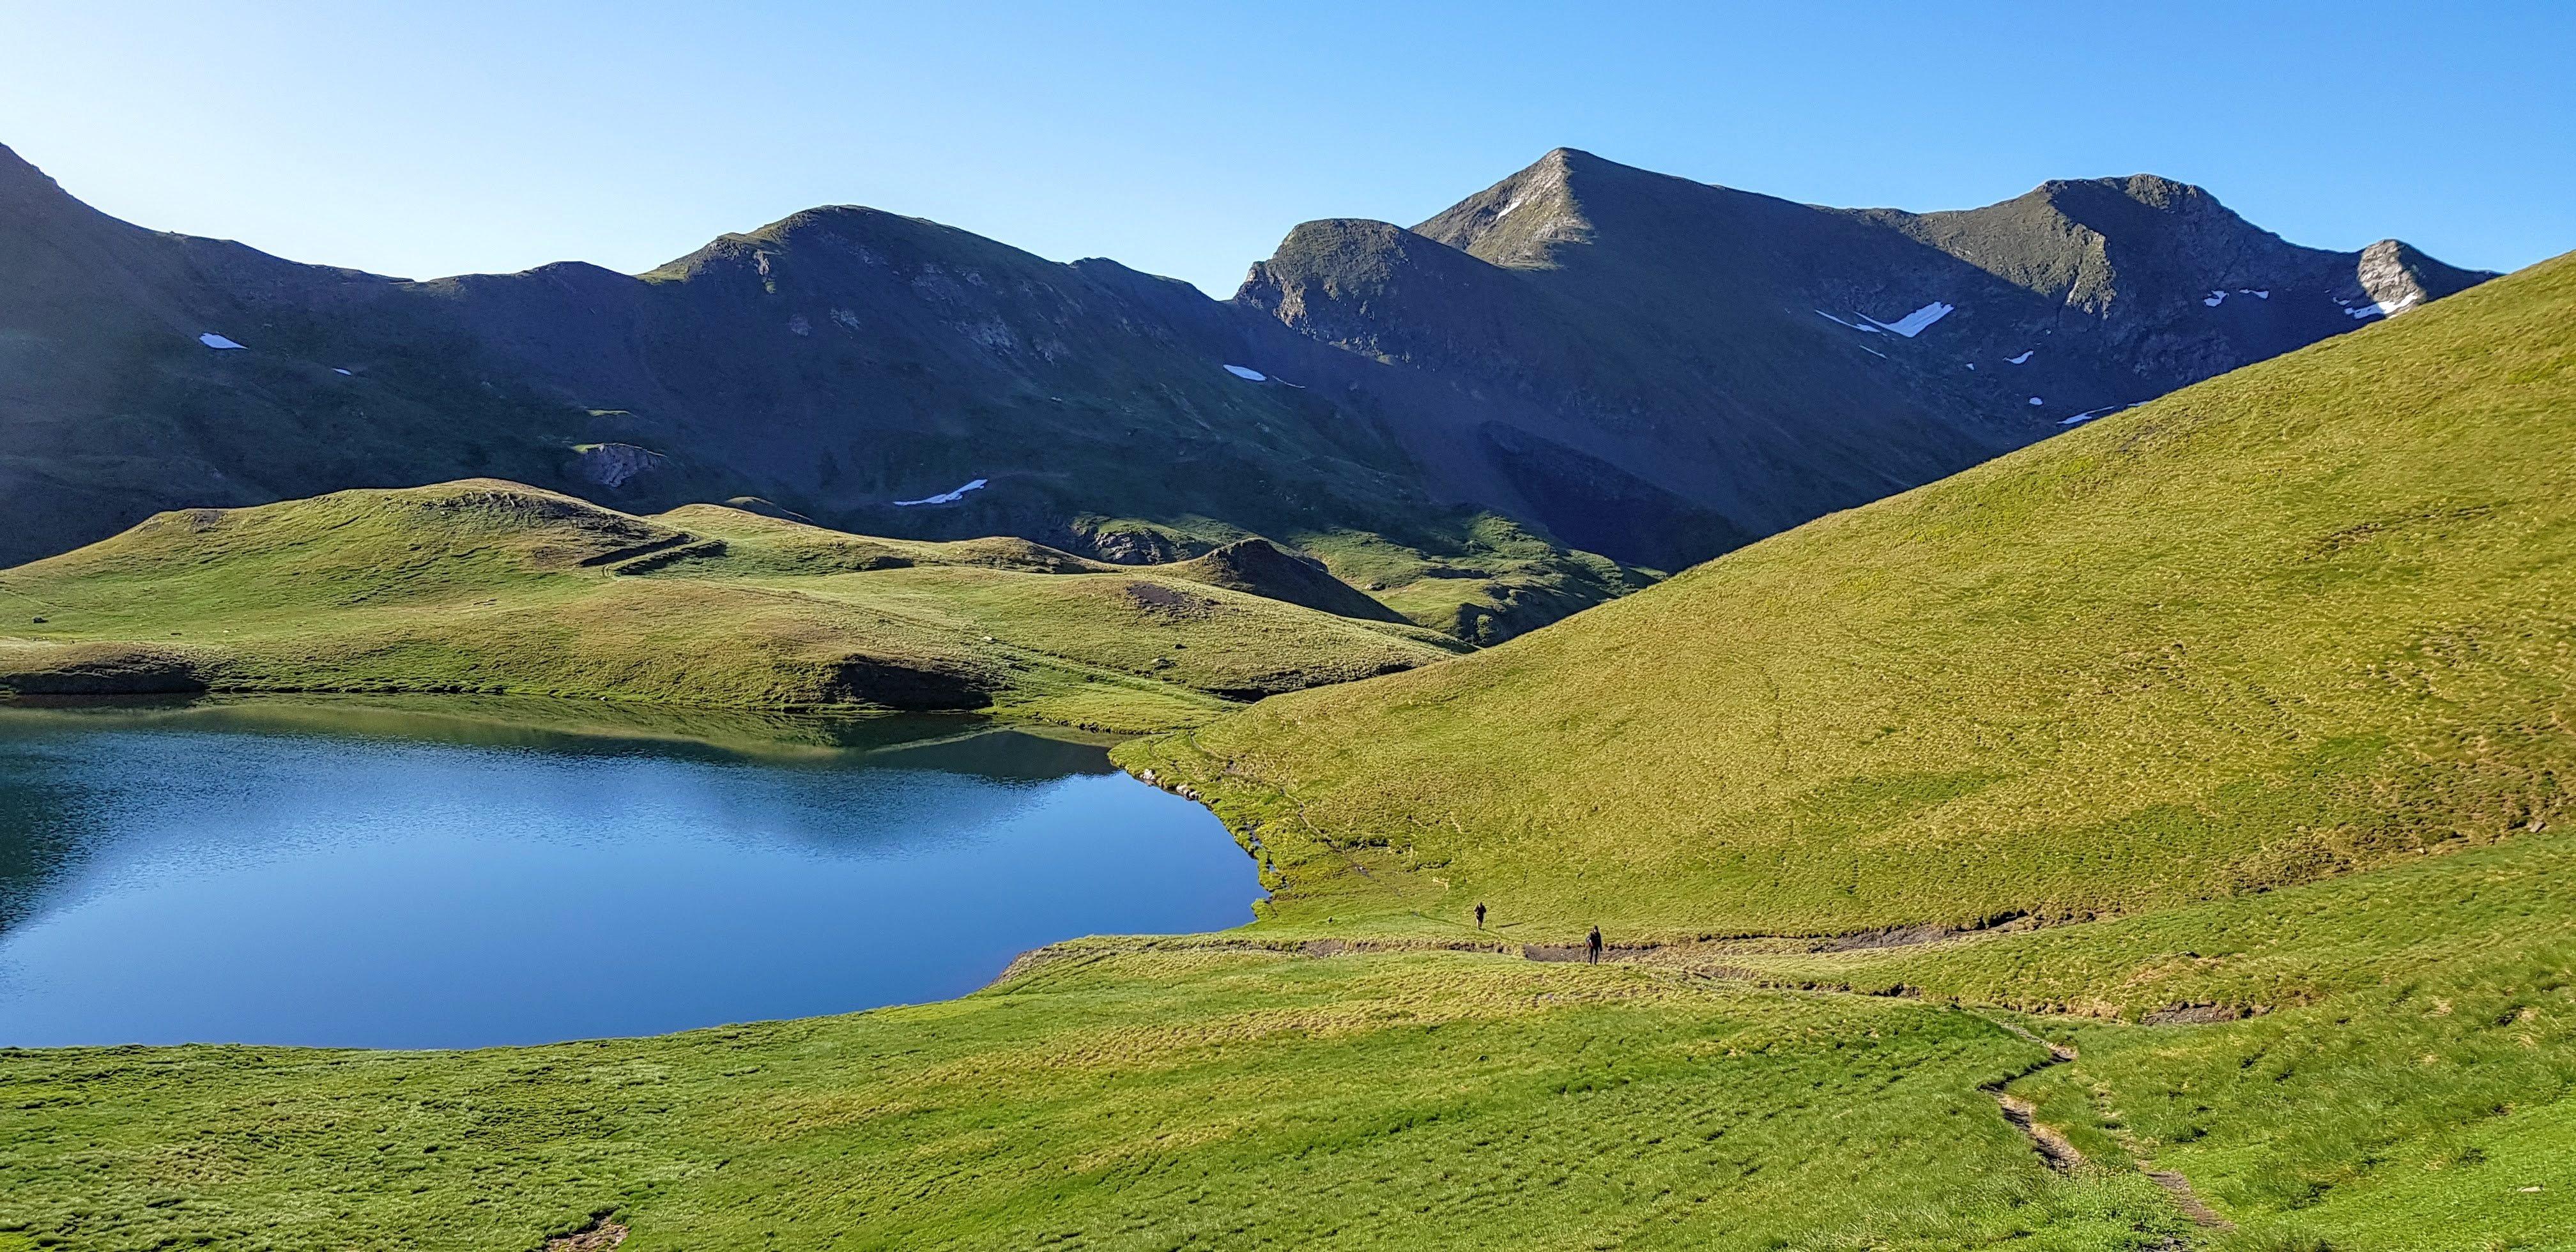 Lac de Montoliu camino hacia el Mauberme